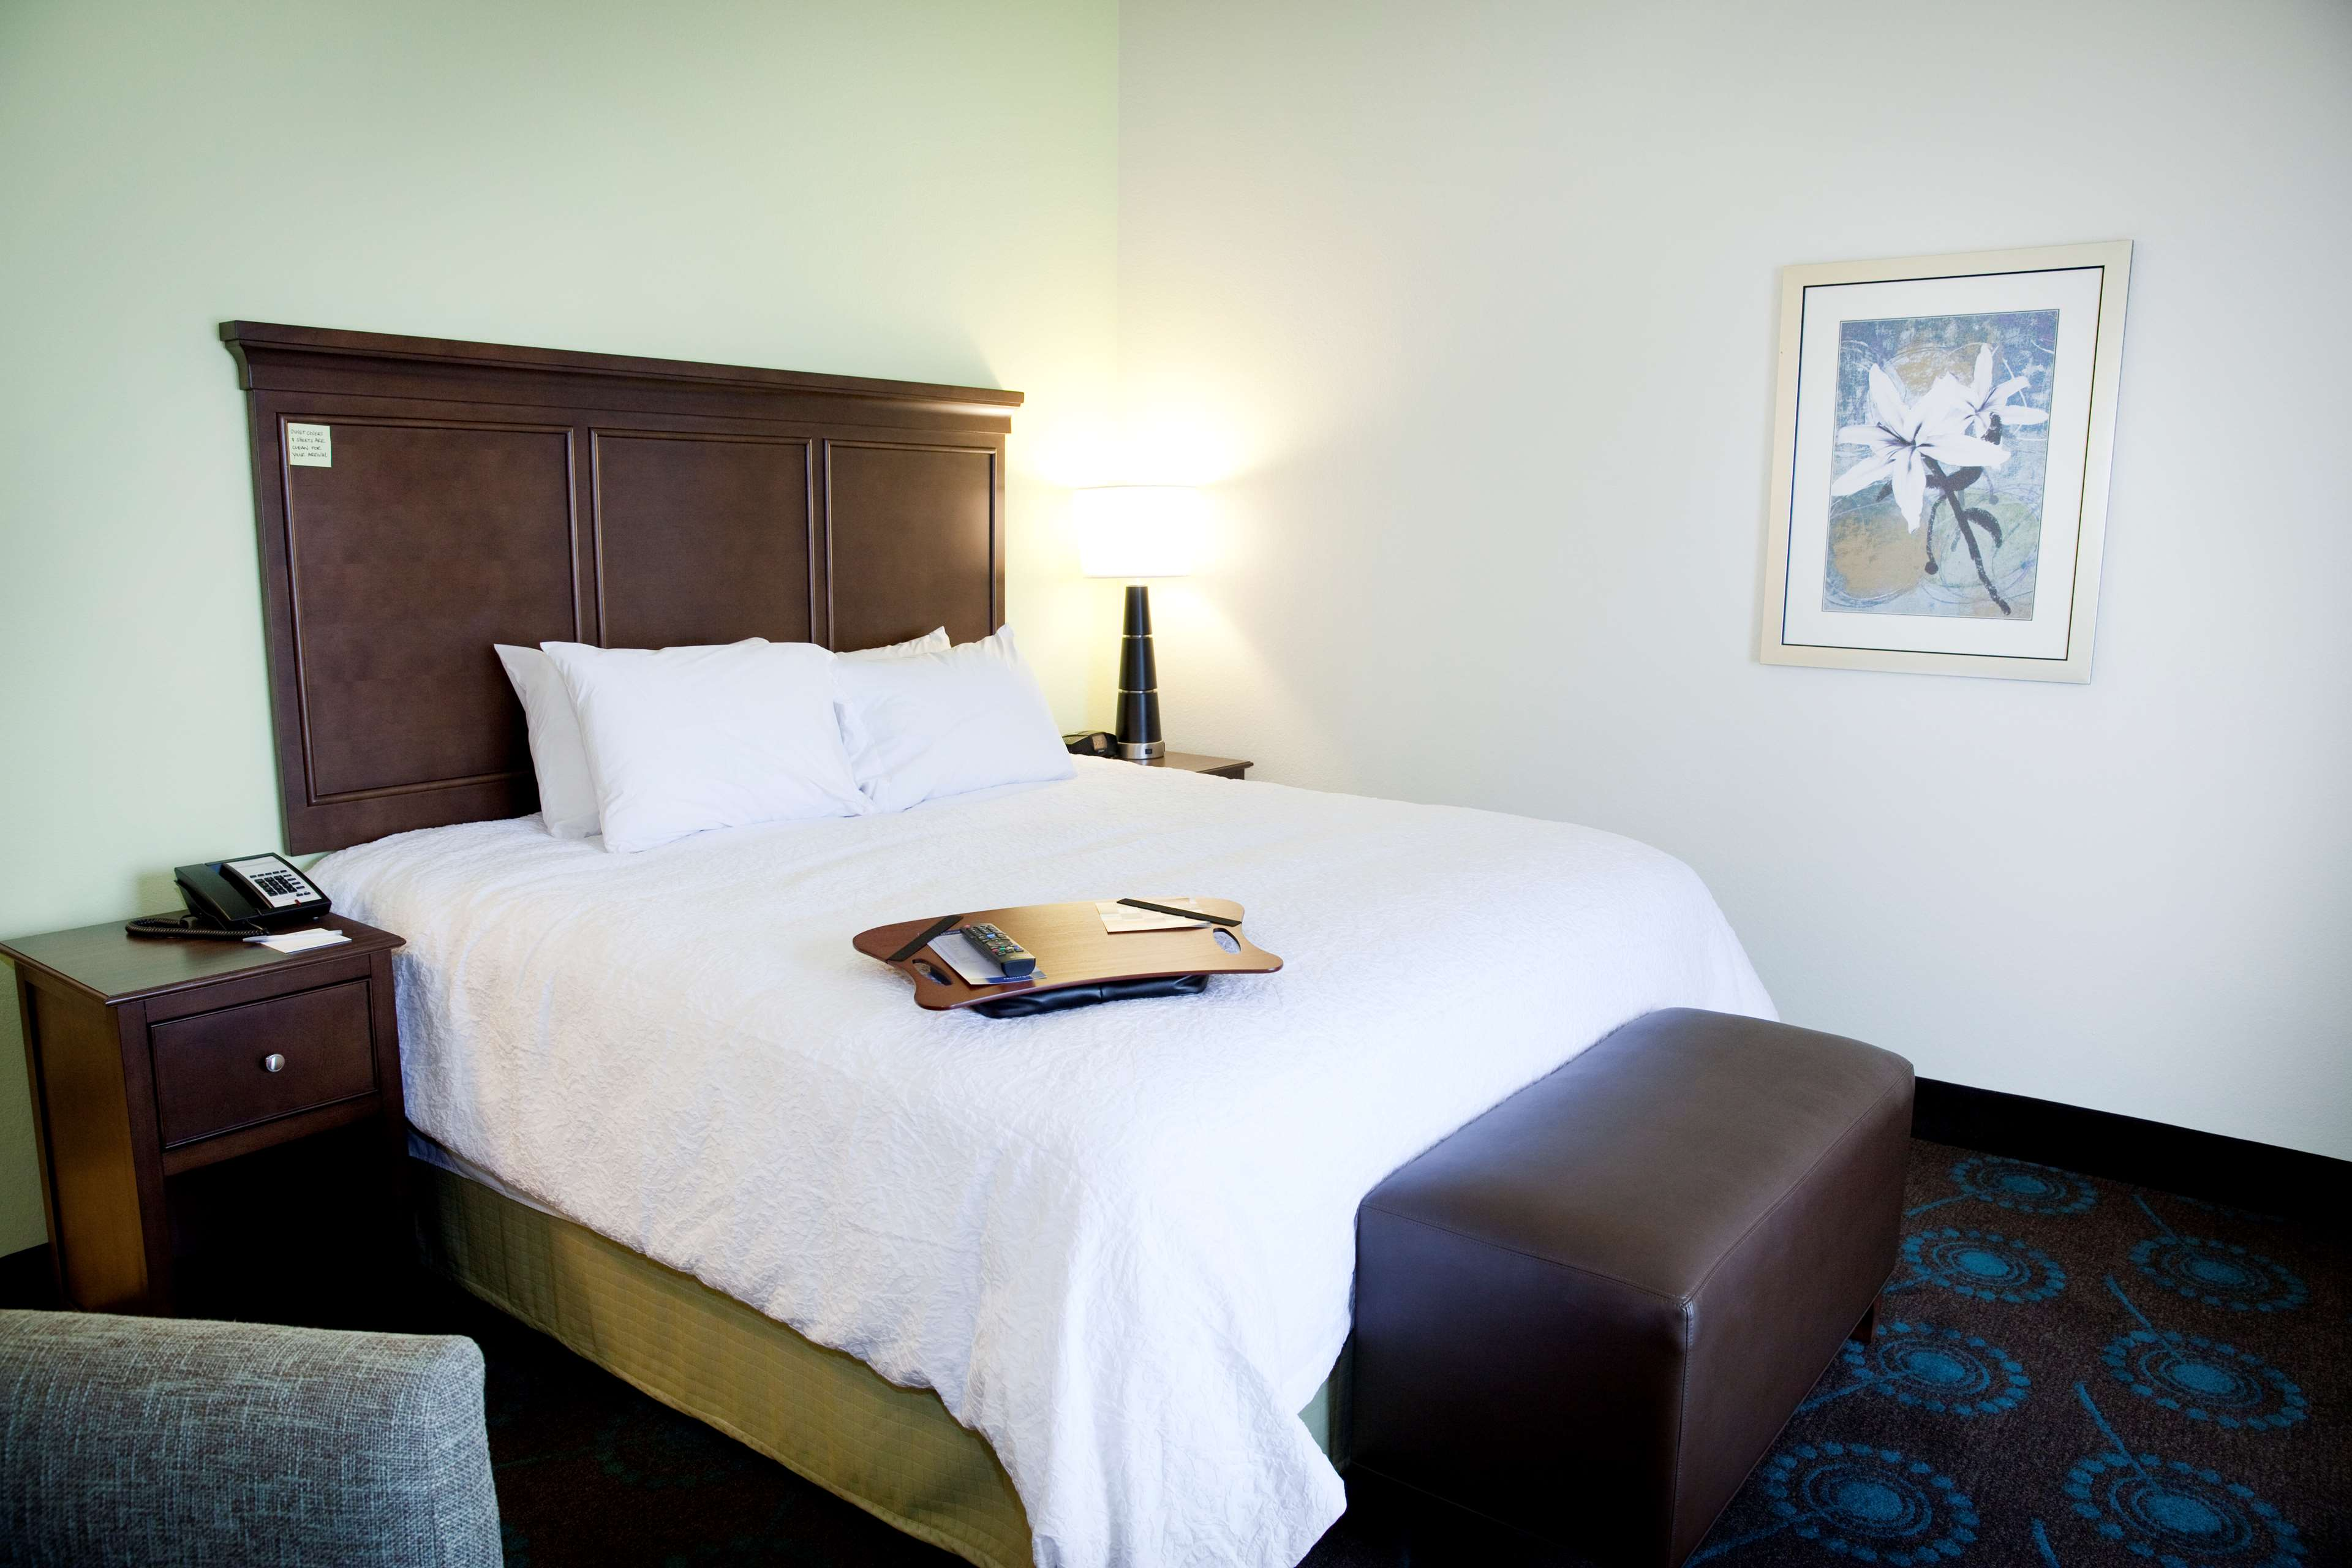 Hampton Inn & Suites Wheeling-The Highlands image 11